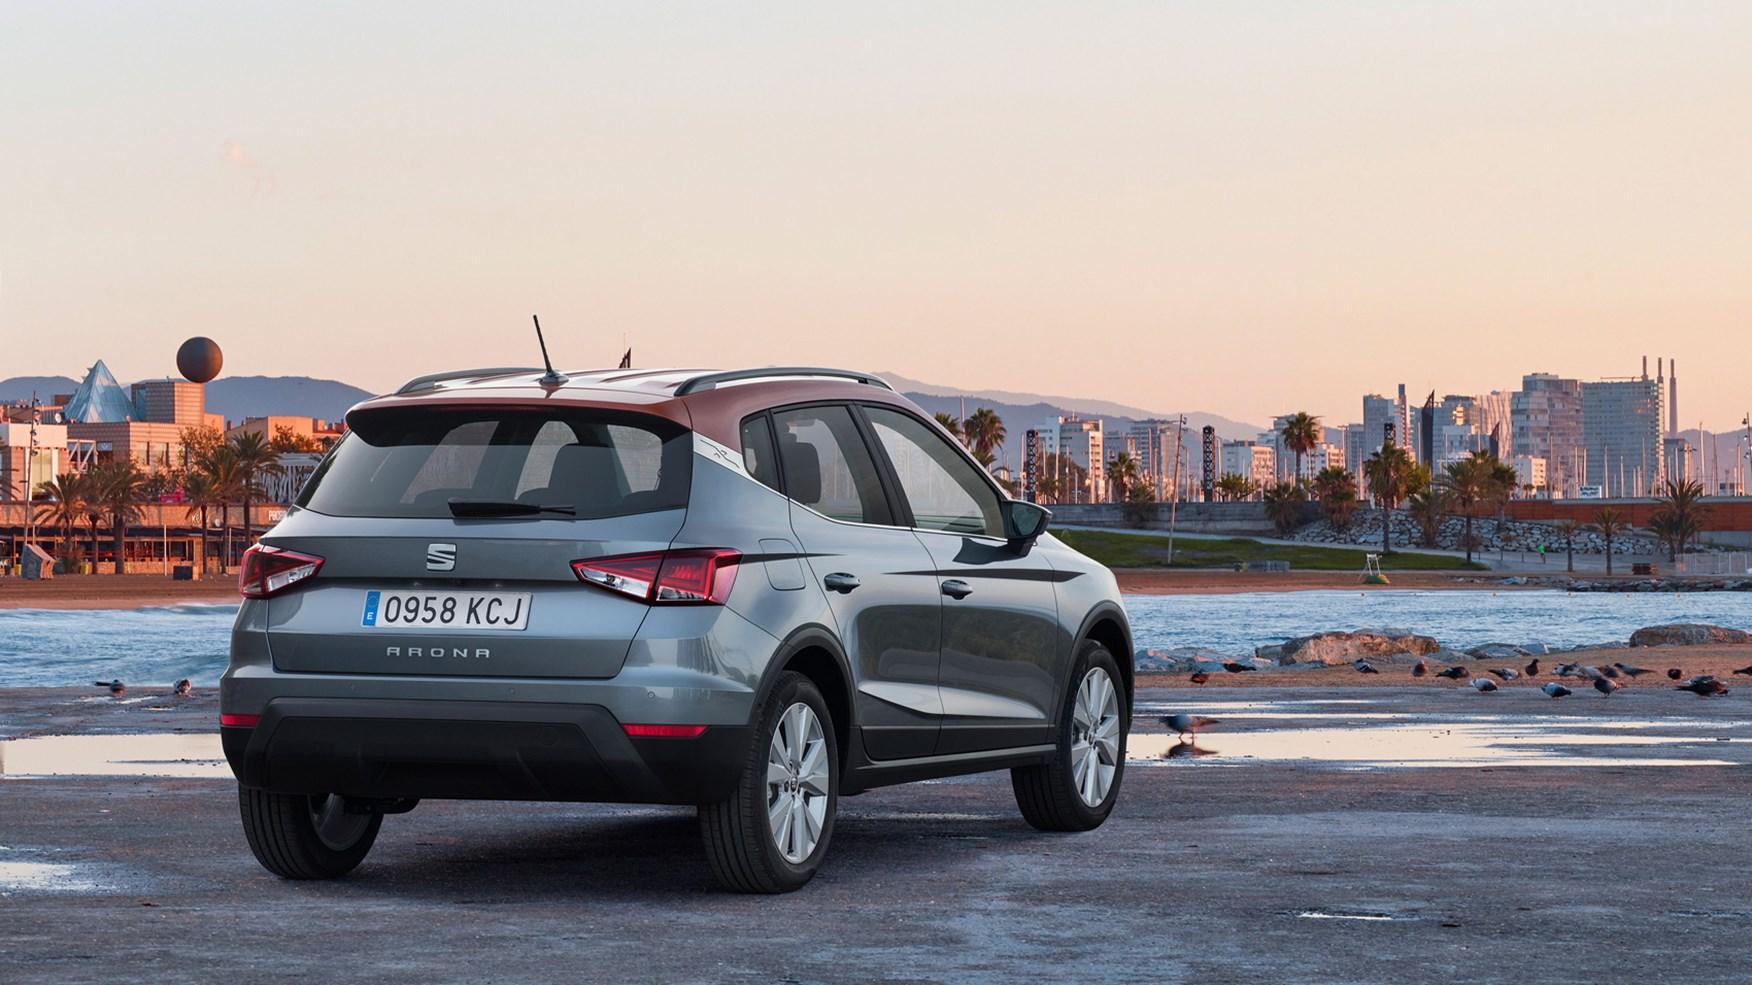 Seat Arona 2017 >> Seat Arona 1.0 SE Technology (2017) review | CAR Magazine